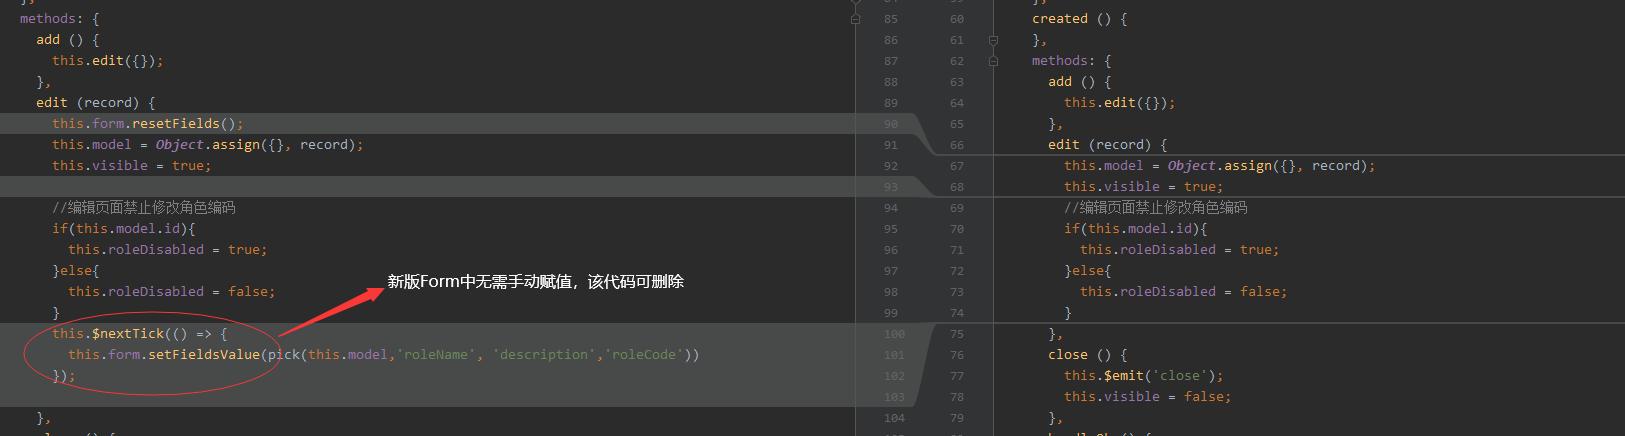 JeecgBoot的前端Form升级为FormModel用法(支持 v-model 绑定)(图4)